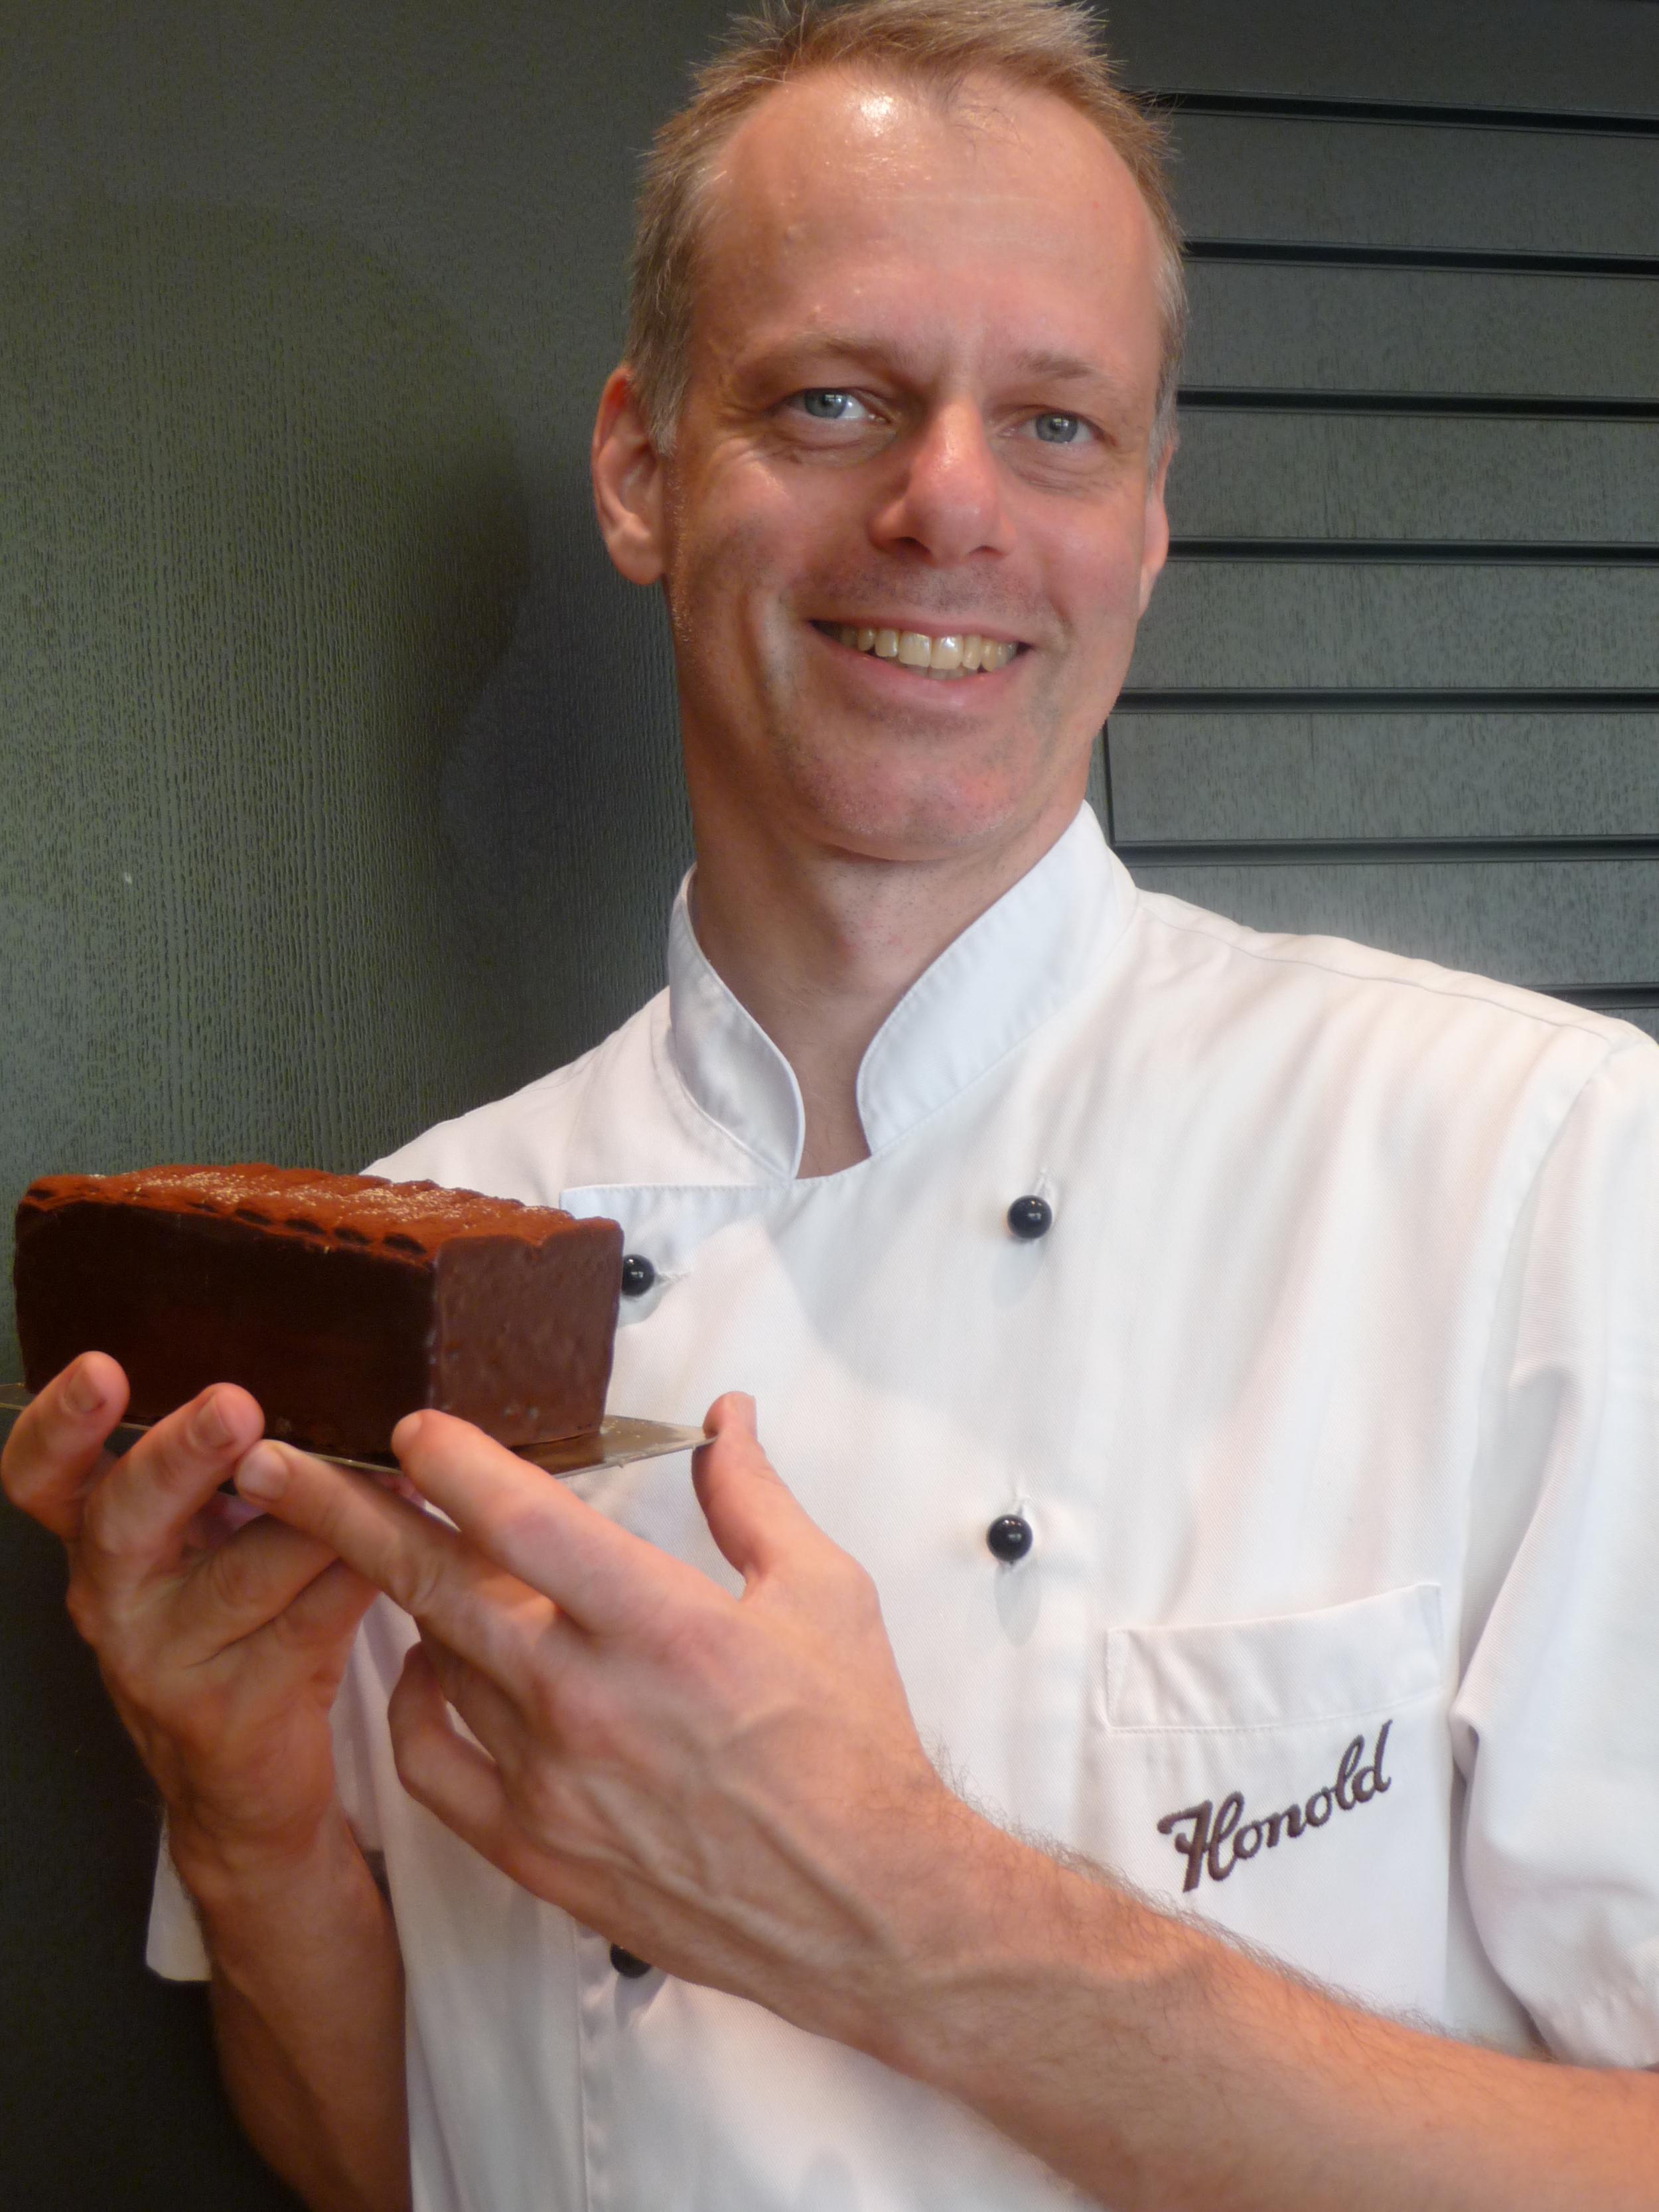 Chef Ivo Jud of Honold